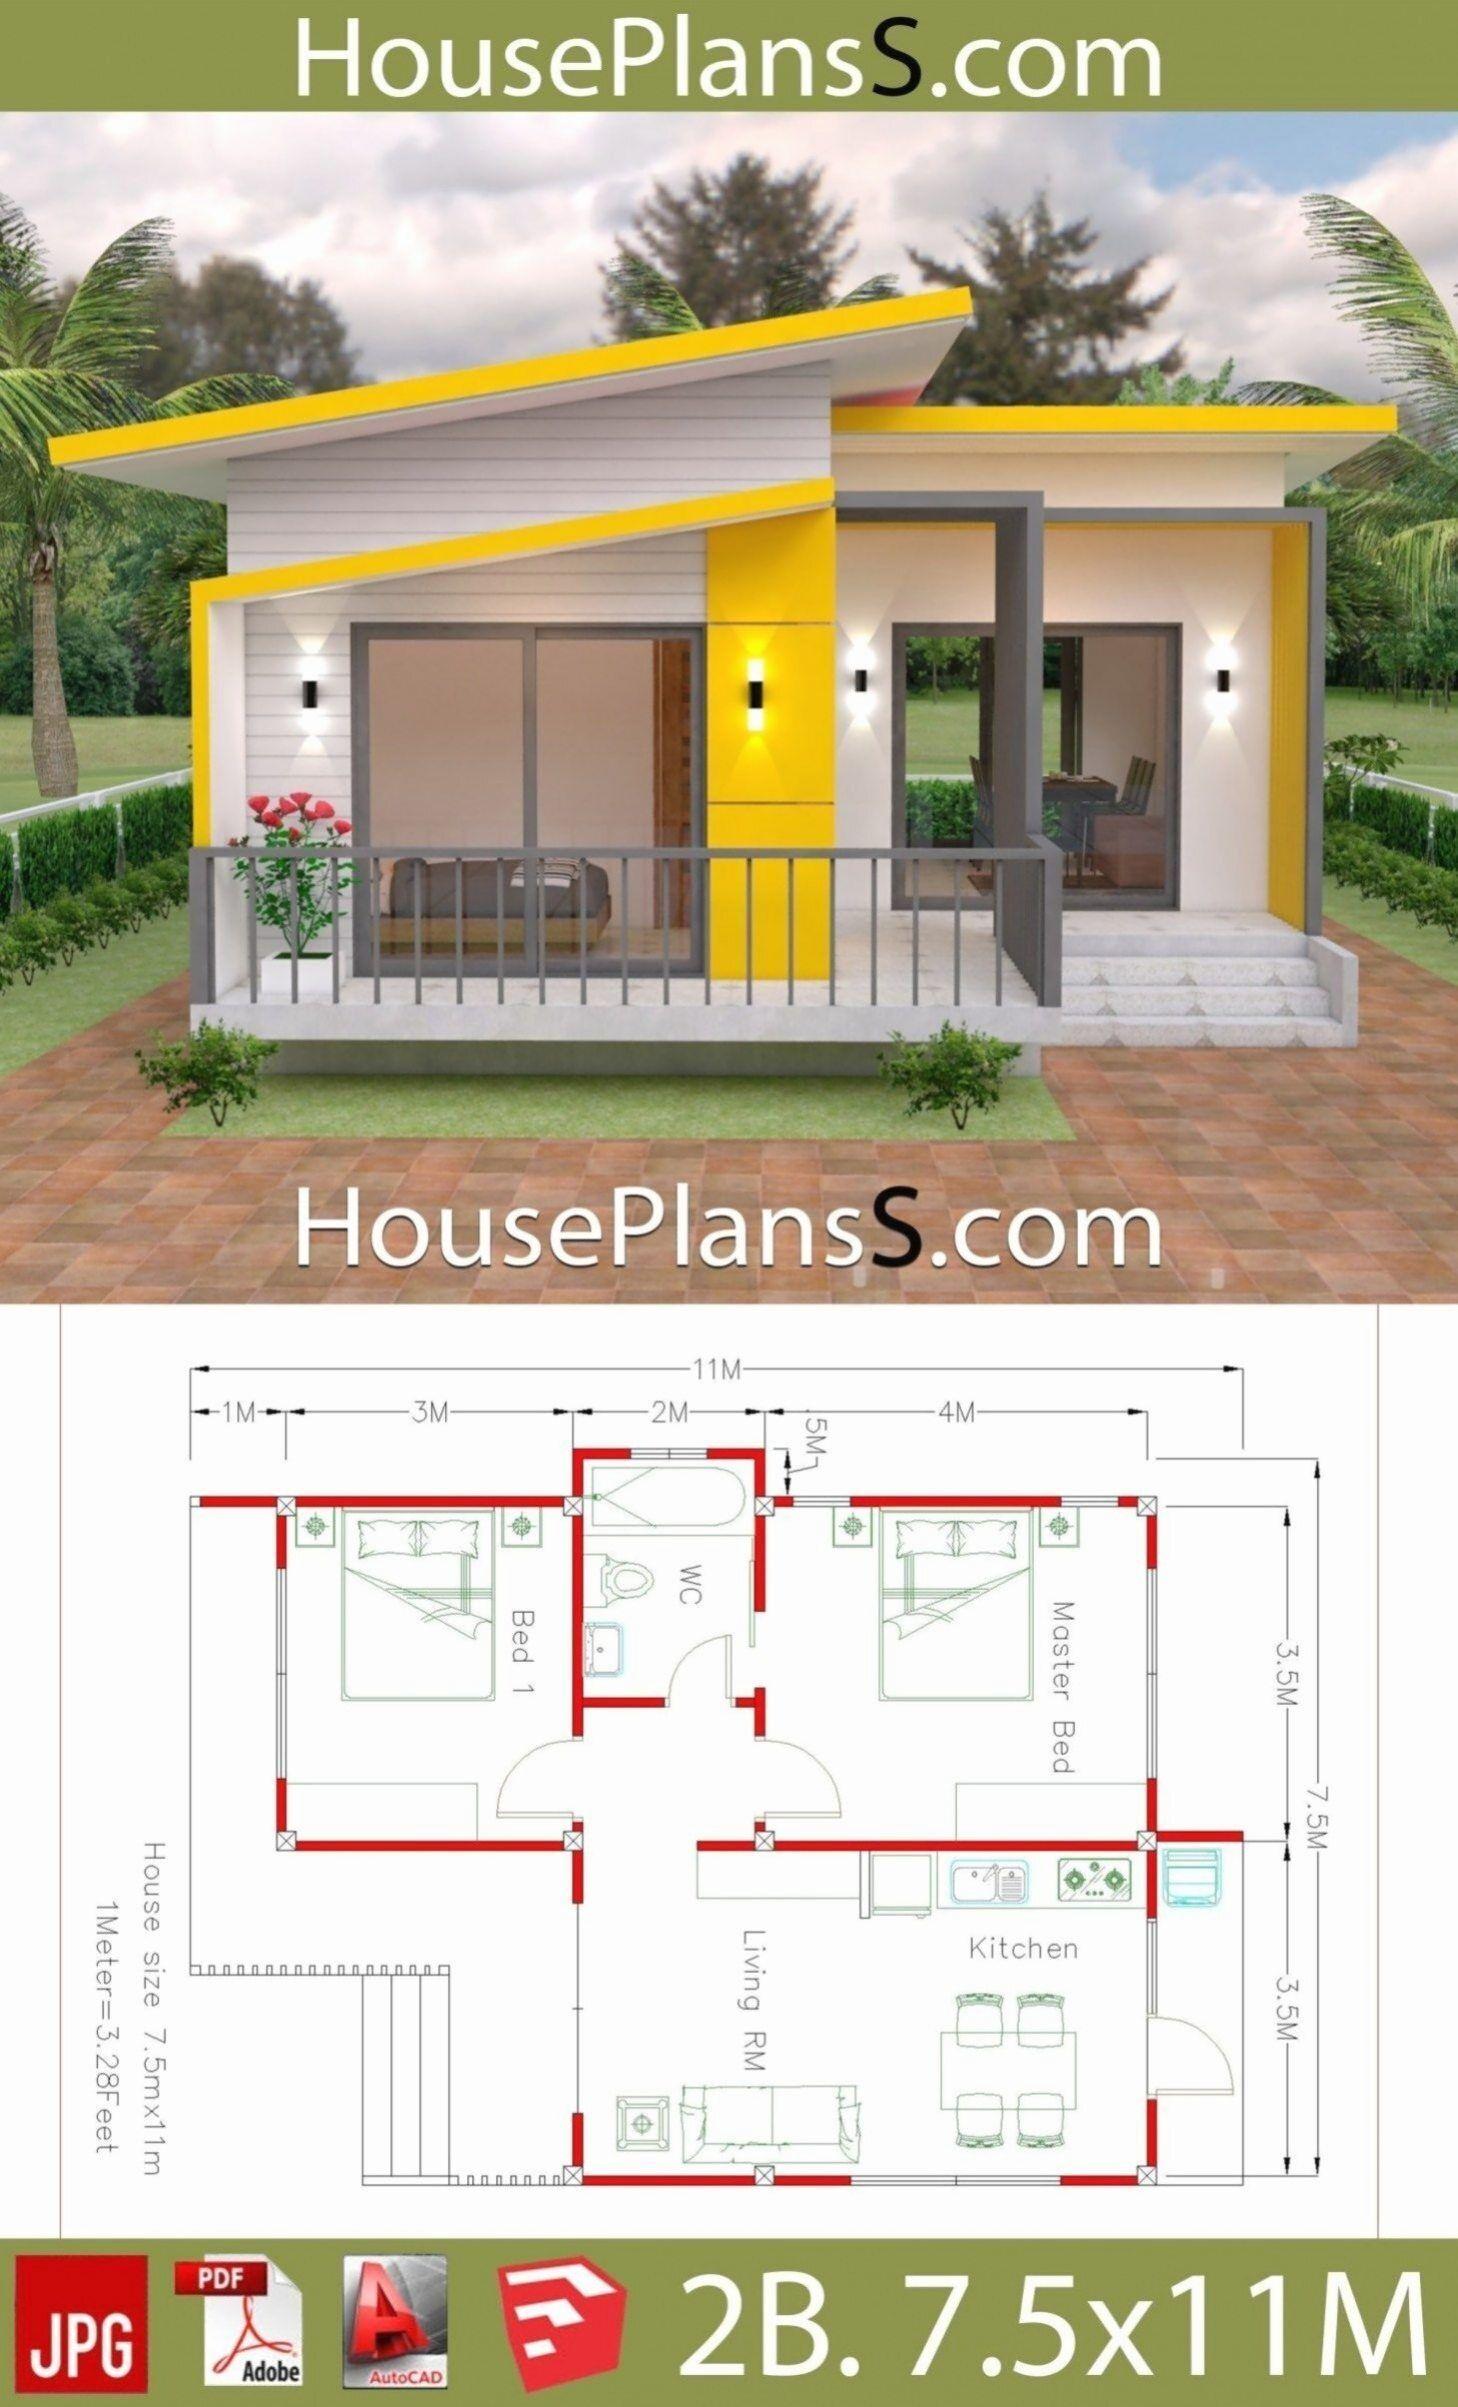 House Plans 7 5x With 2 Bedrooms Full Plans House Plans 3d House Plans 7 5 With 2 Bedrooms Full Plans House Plan Rumah Indah Arsitektur Arsitektur Rumah